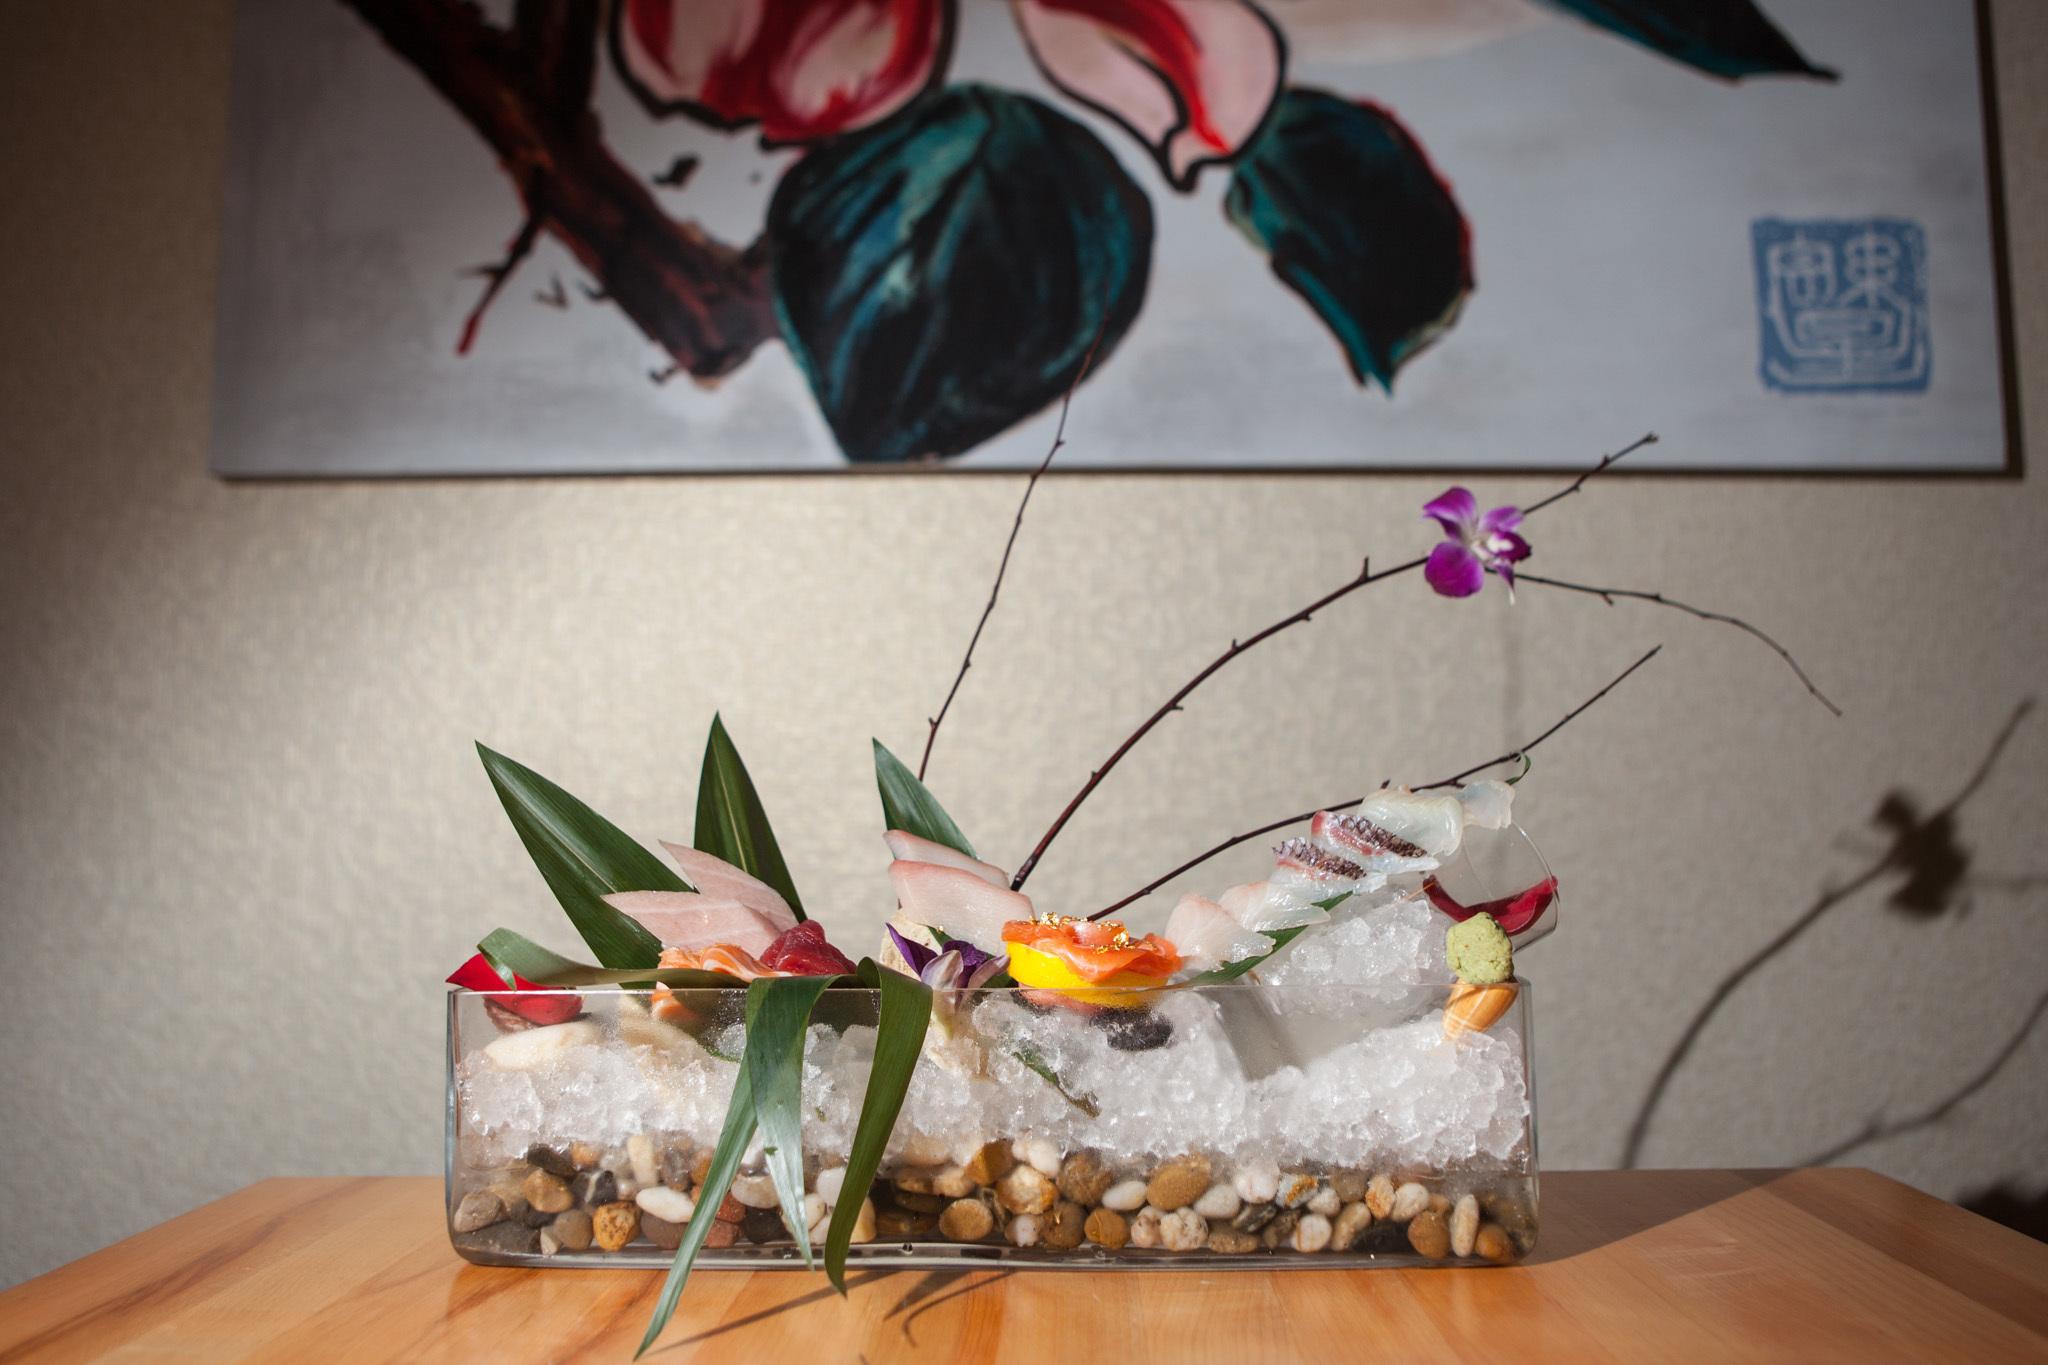 100 best, 100 best 2014, chi_fd_100Best_ss_1214, dec 2014, 100 best, 12.2014, chi_fd_100BestEntrees_ss_1214, 100 best entrees 2014, Chef's choice sashimi, Juno